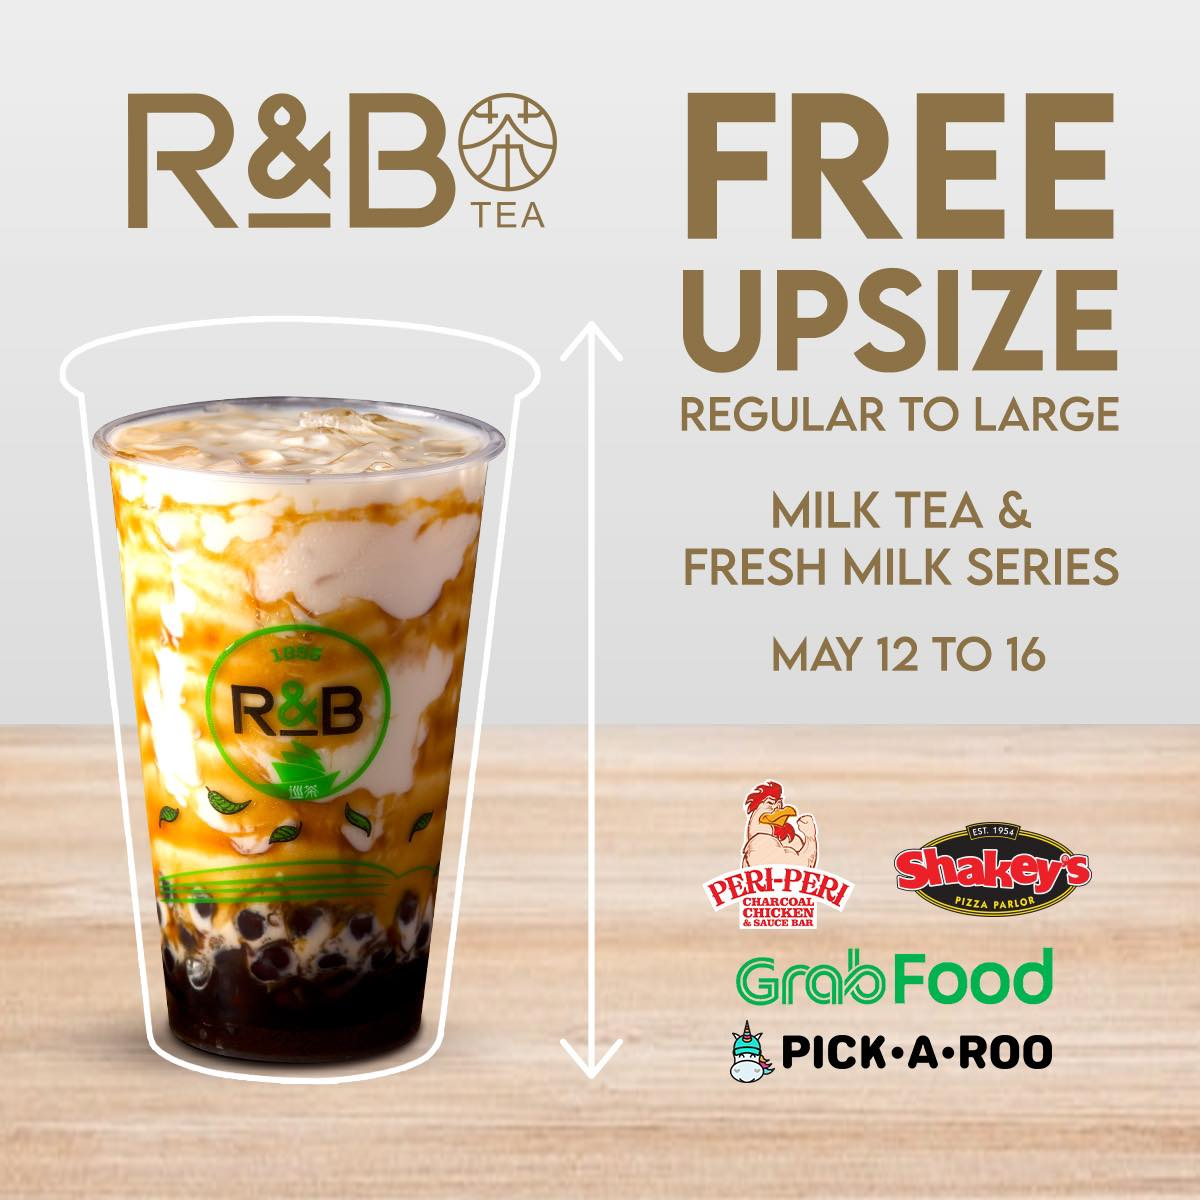 R&B Milk Tea Promo Free Upsize from Regular to Large